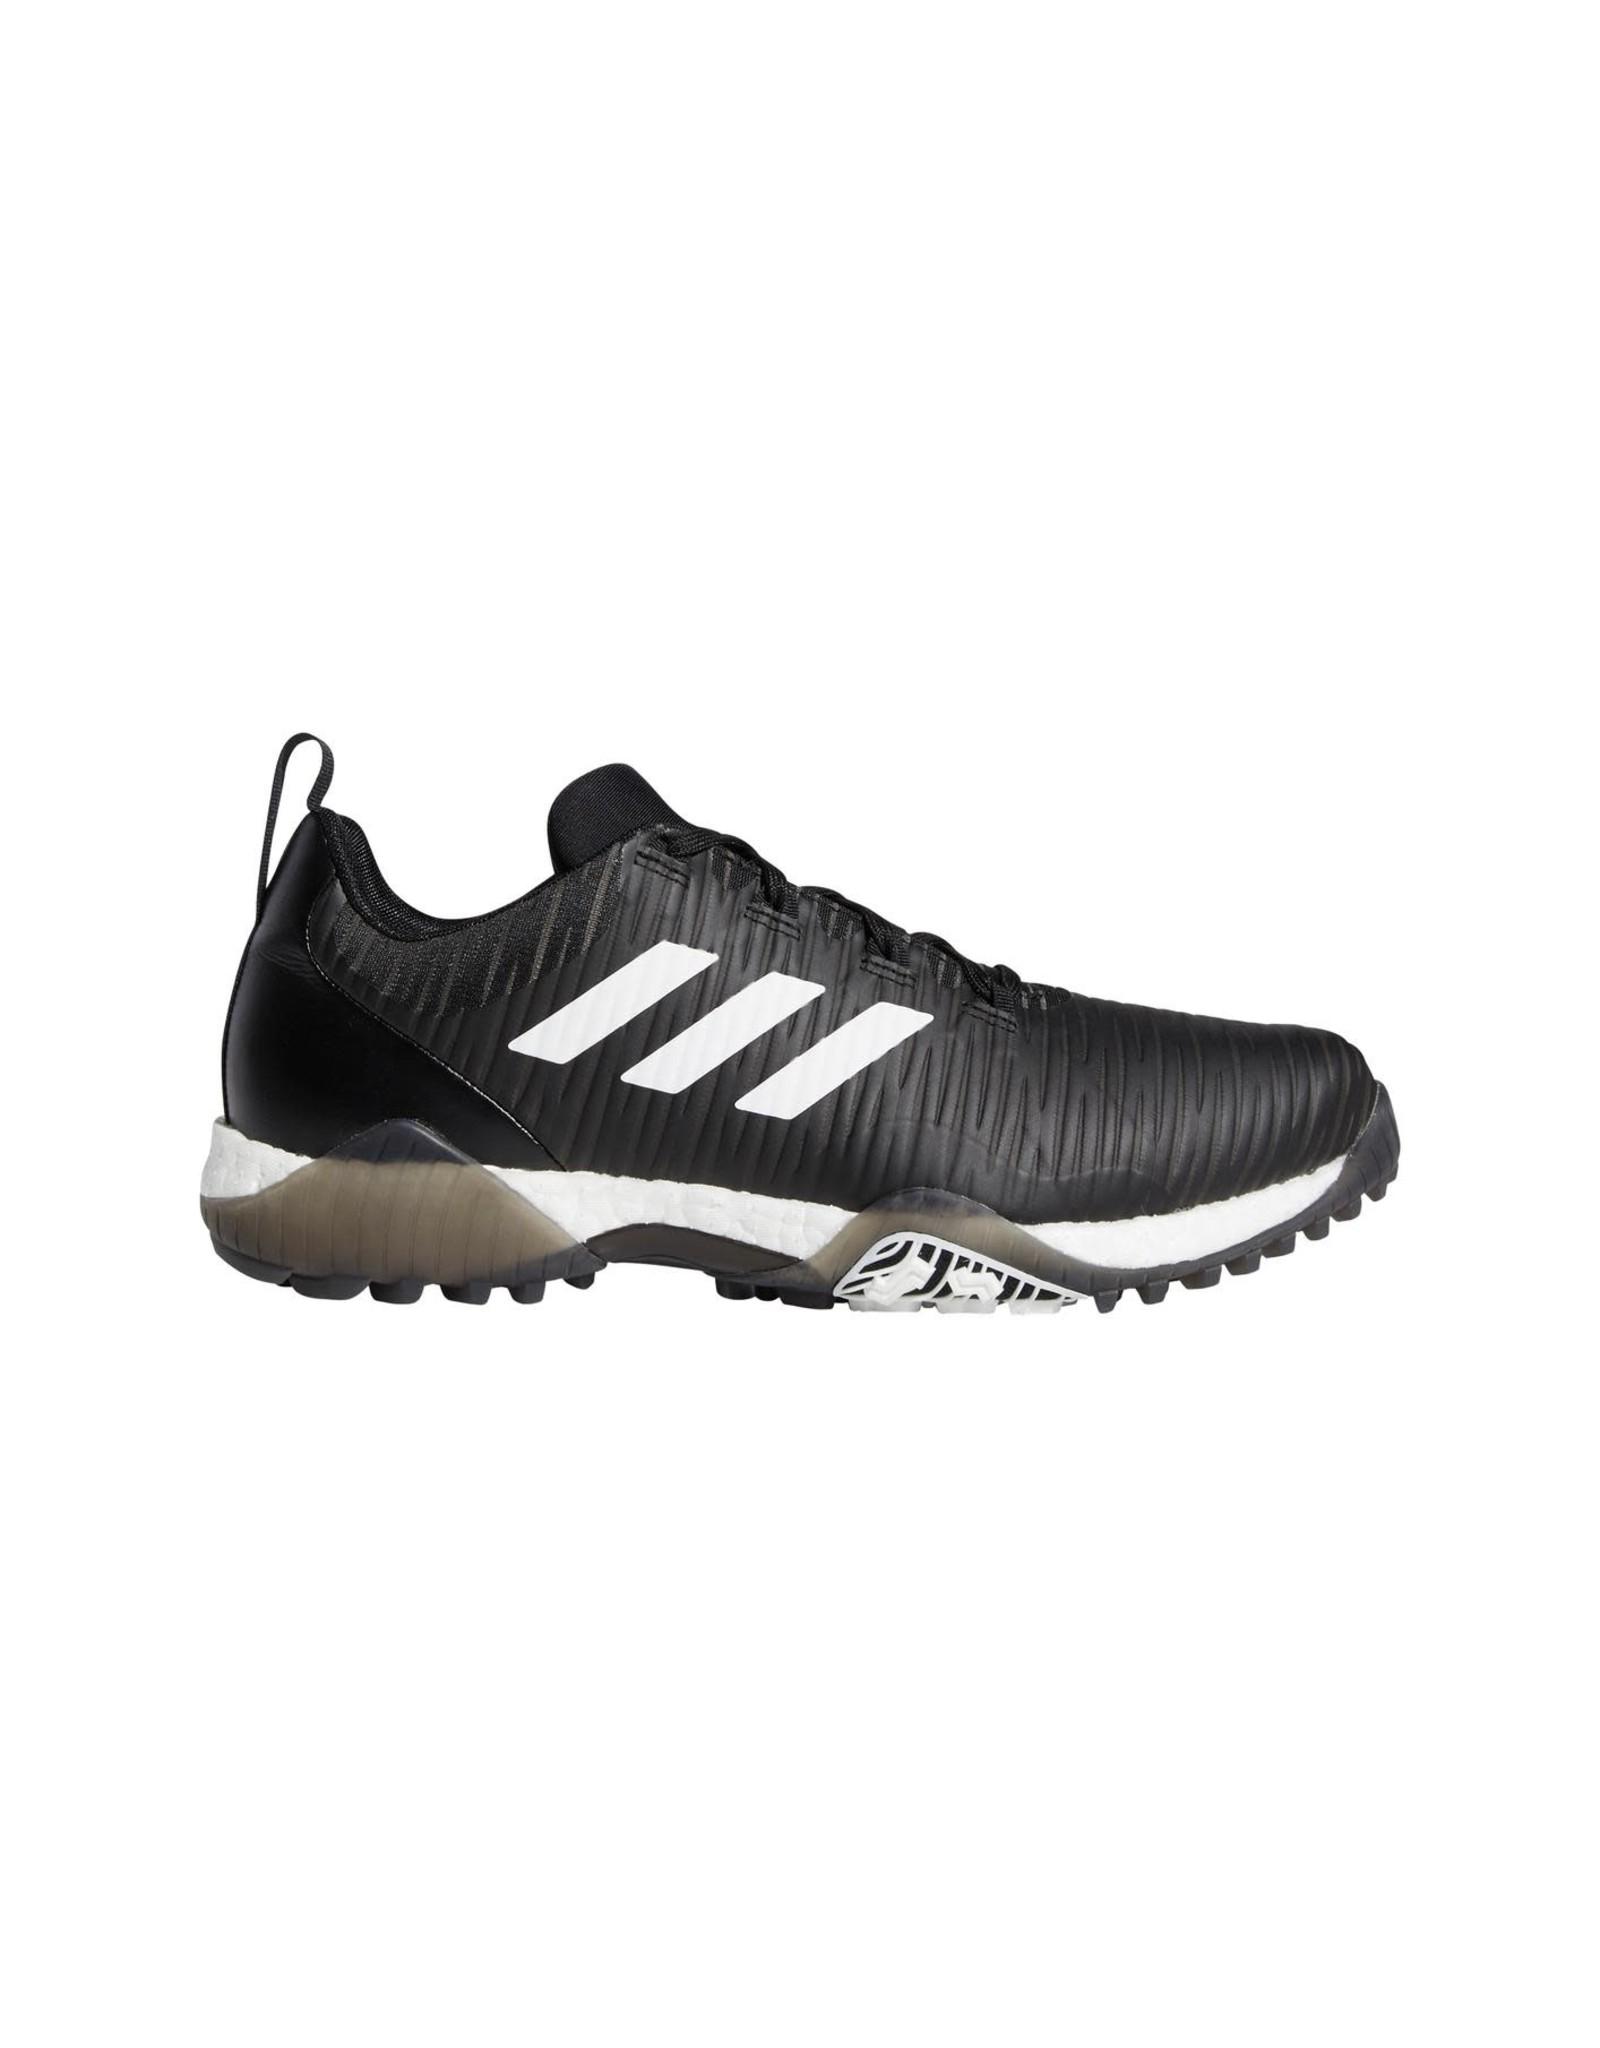 Adidas Shoe Adi Code Chaos